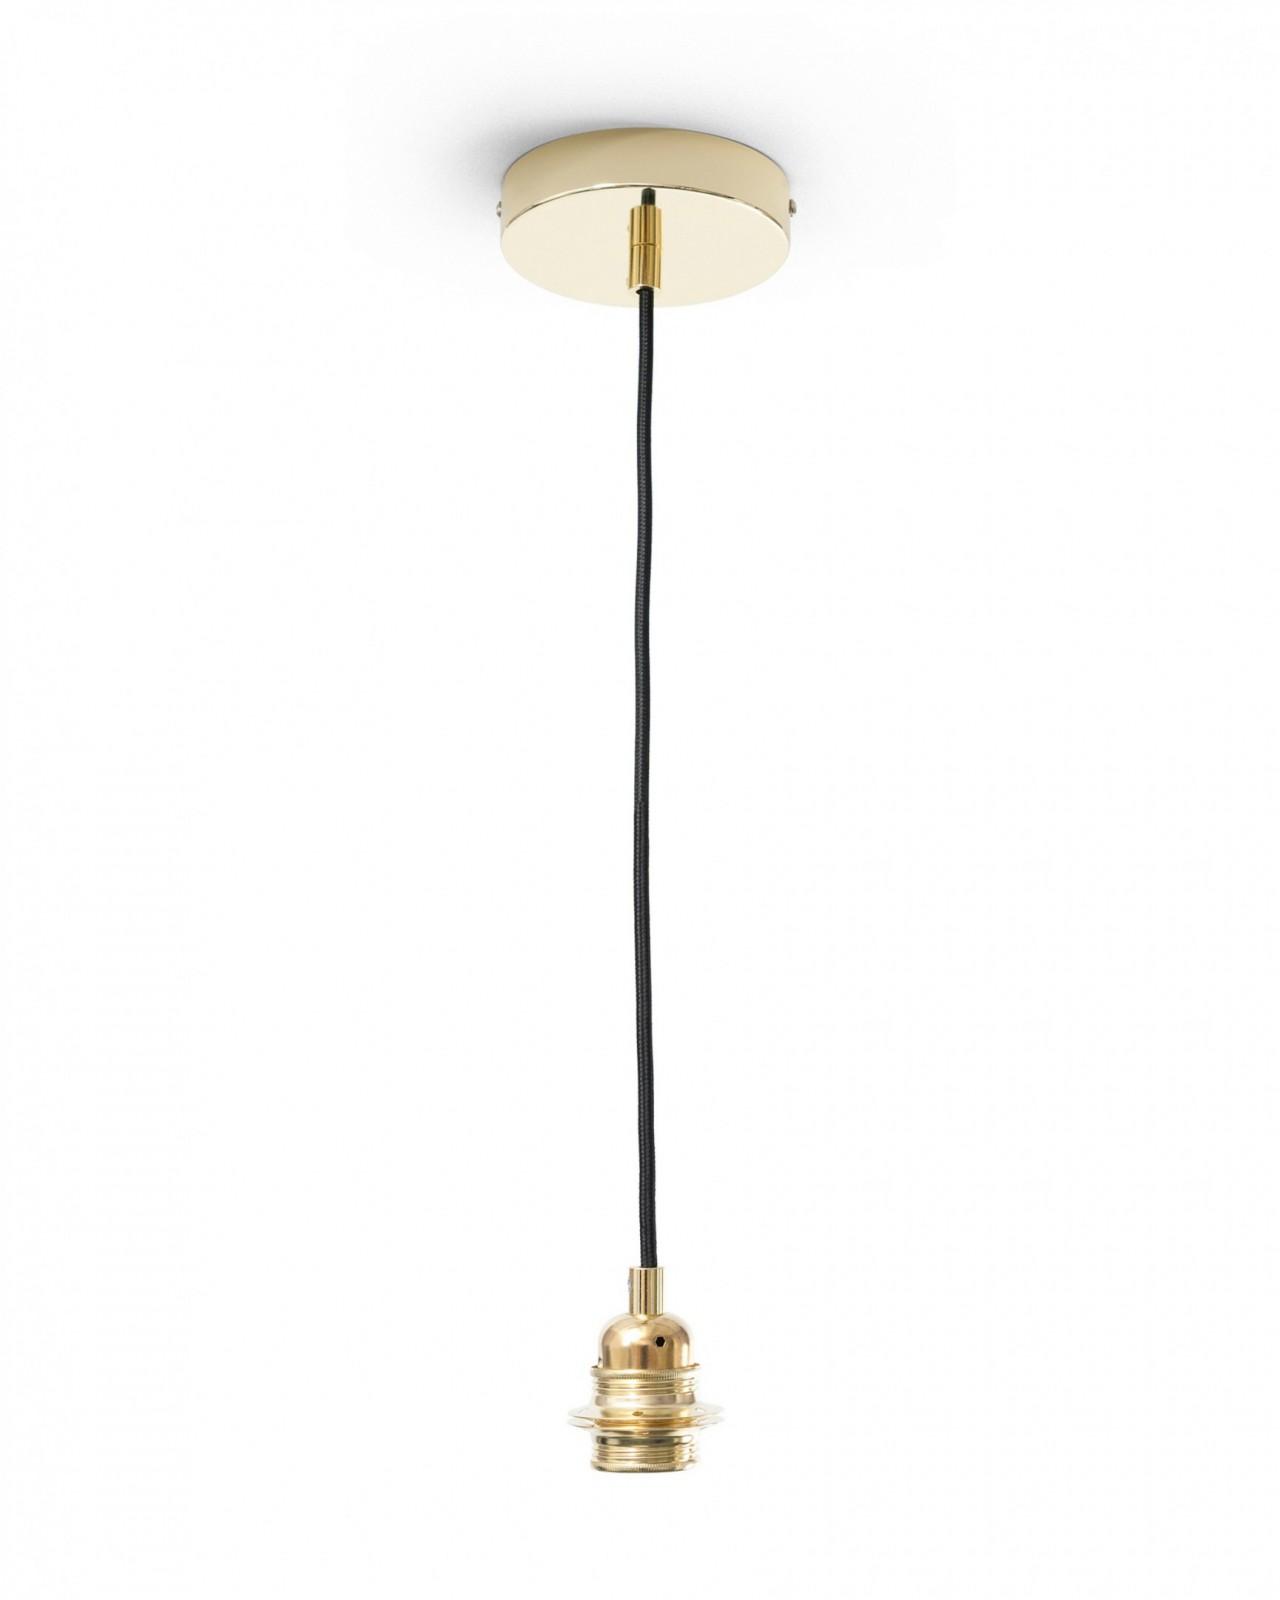 KATALIN Pendant Lamp